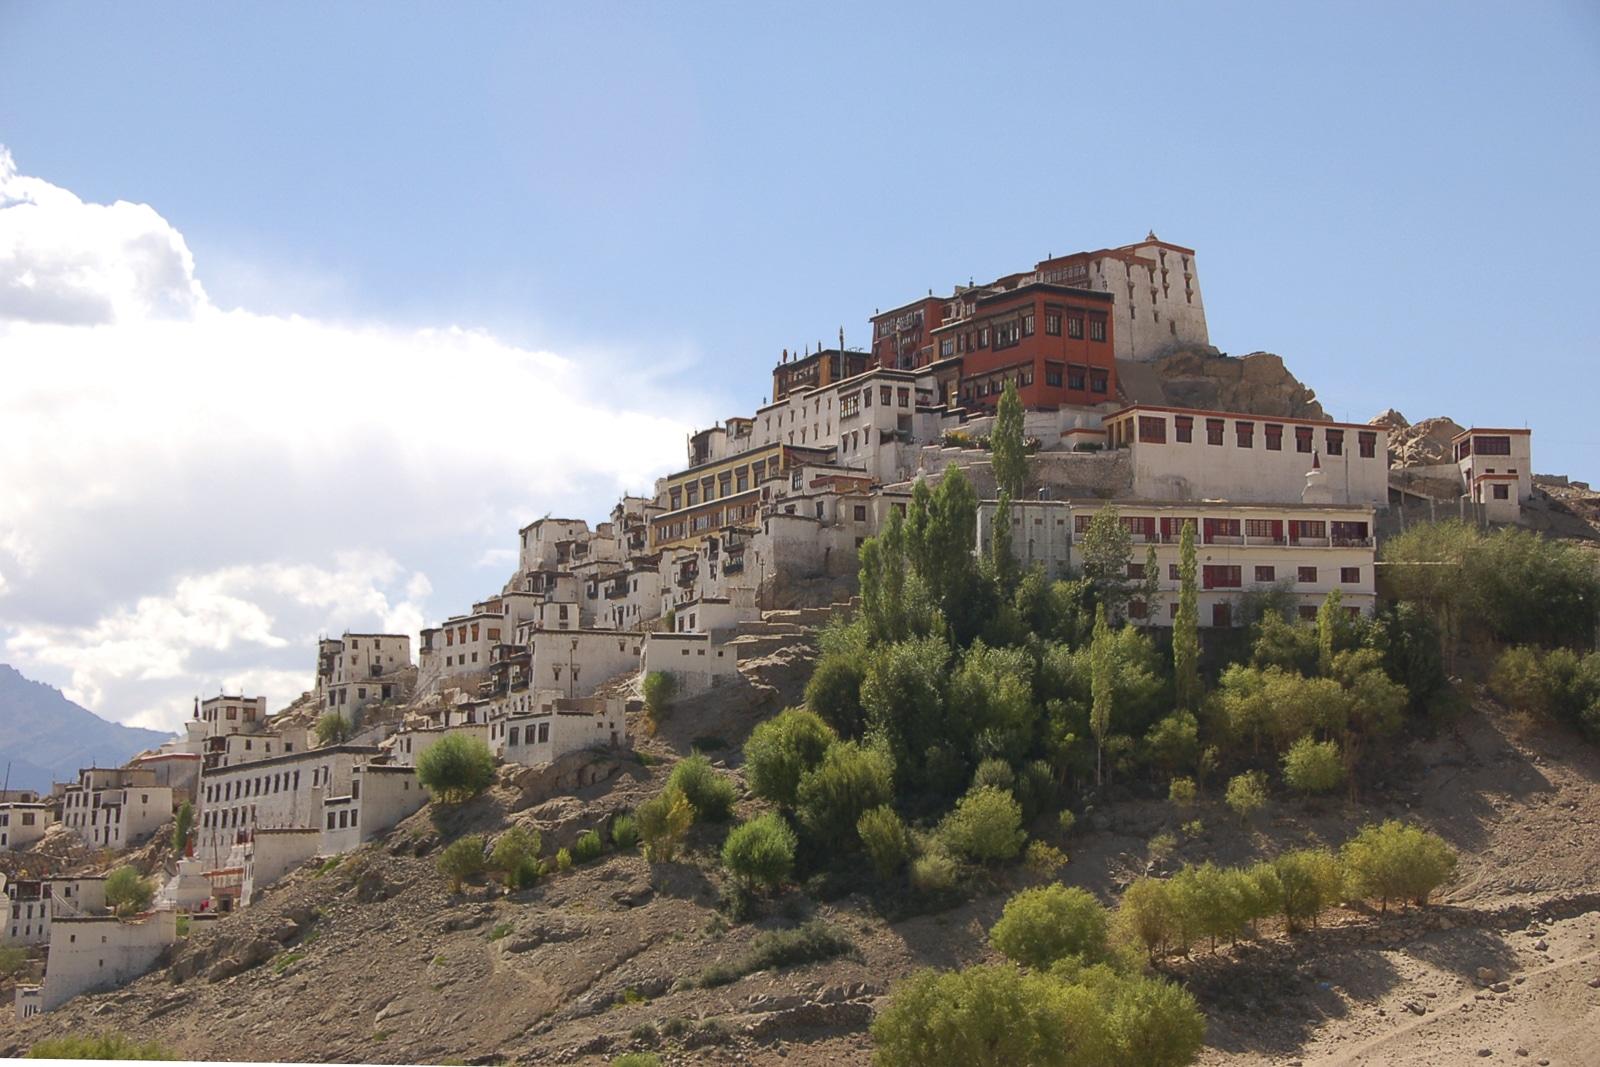 img-diapo-tab - Inde-montagne-1600x900-21.jpg